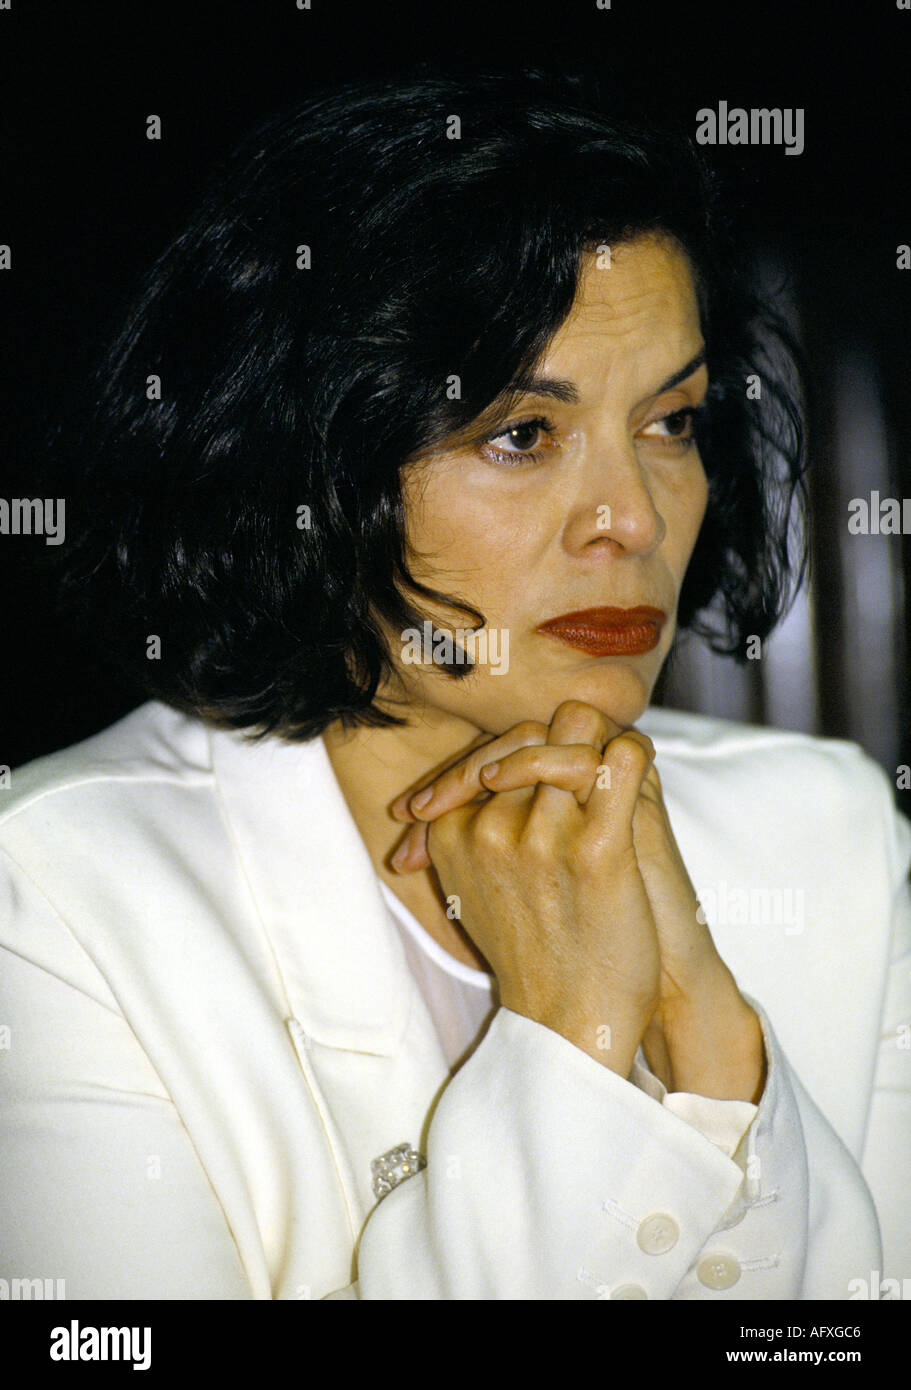 colour portrait of 'Bianca Jagger' human rights activist  circa 1995 - Stock Image